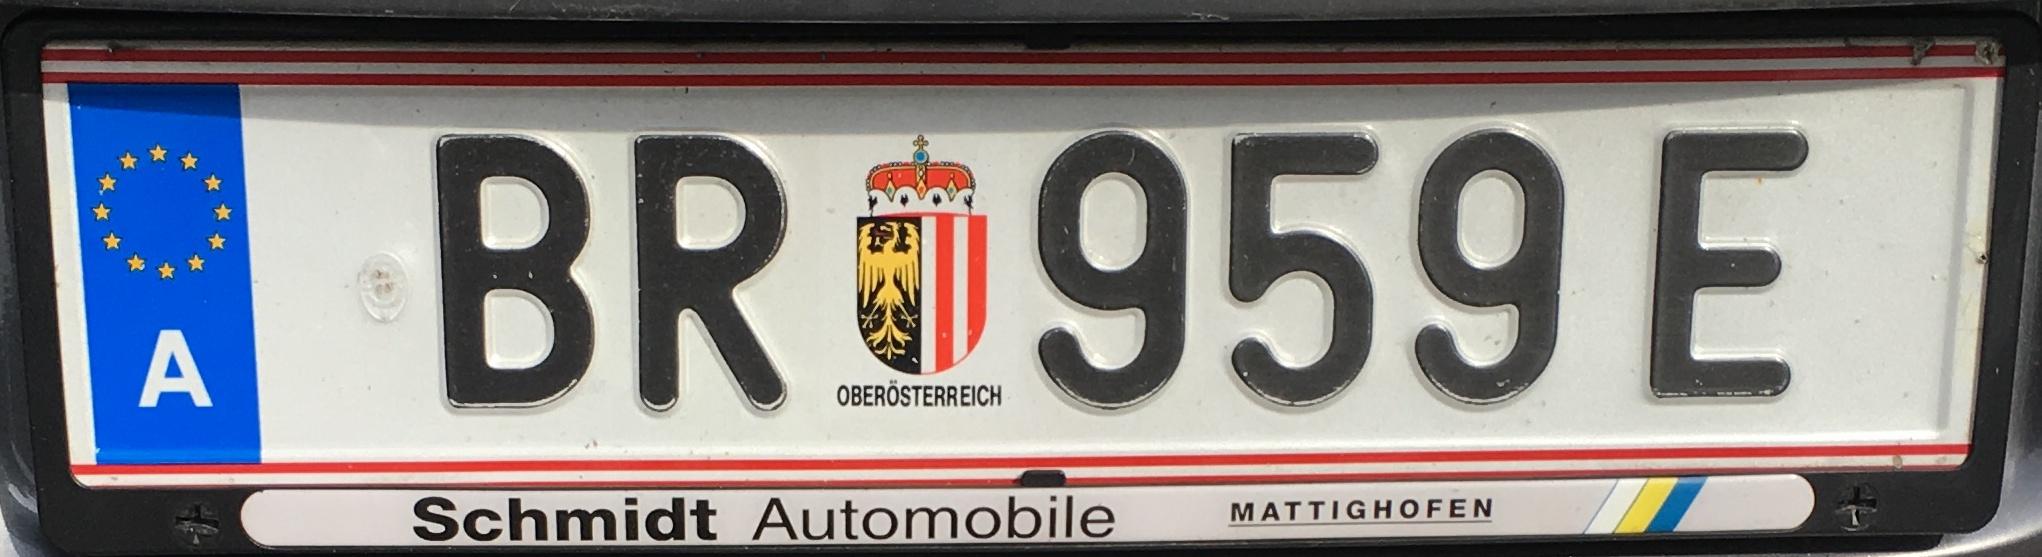 Registrační značka Rakousko - BR - Braunau an Inn, foto: vlastní